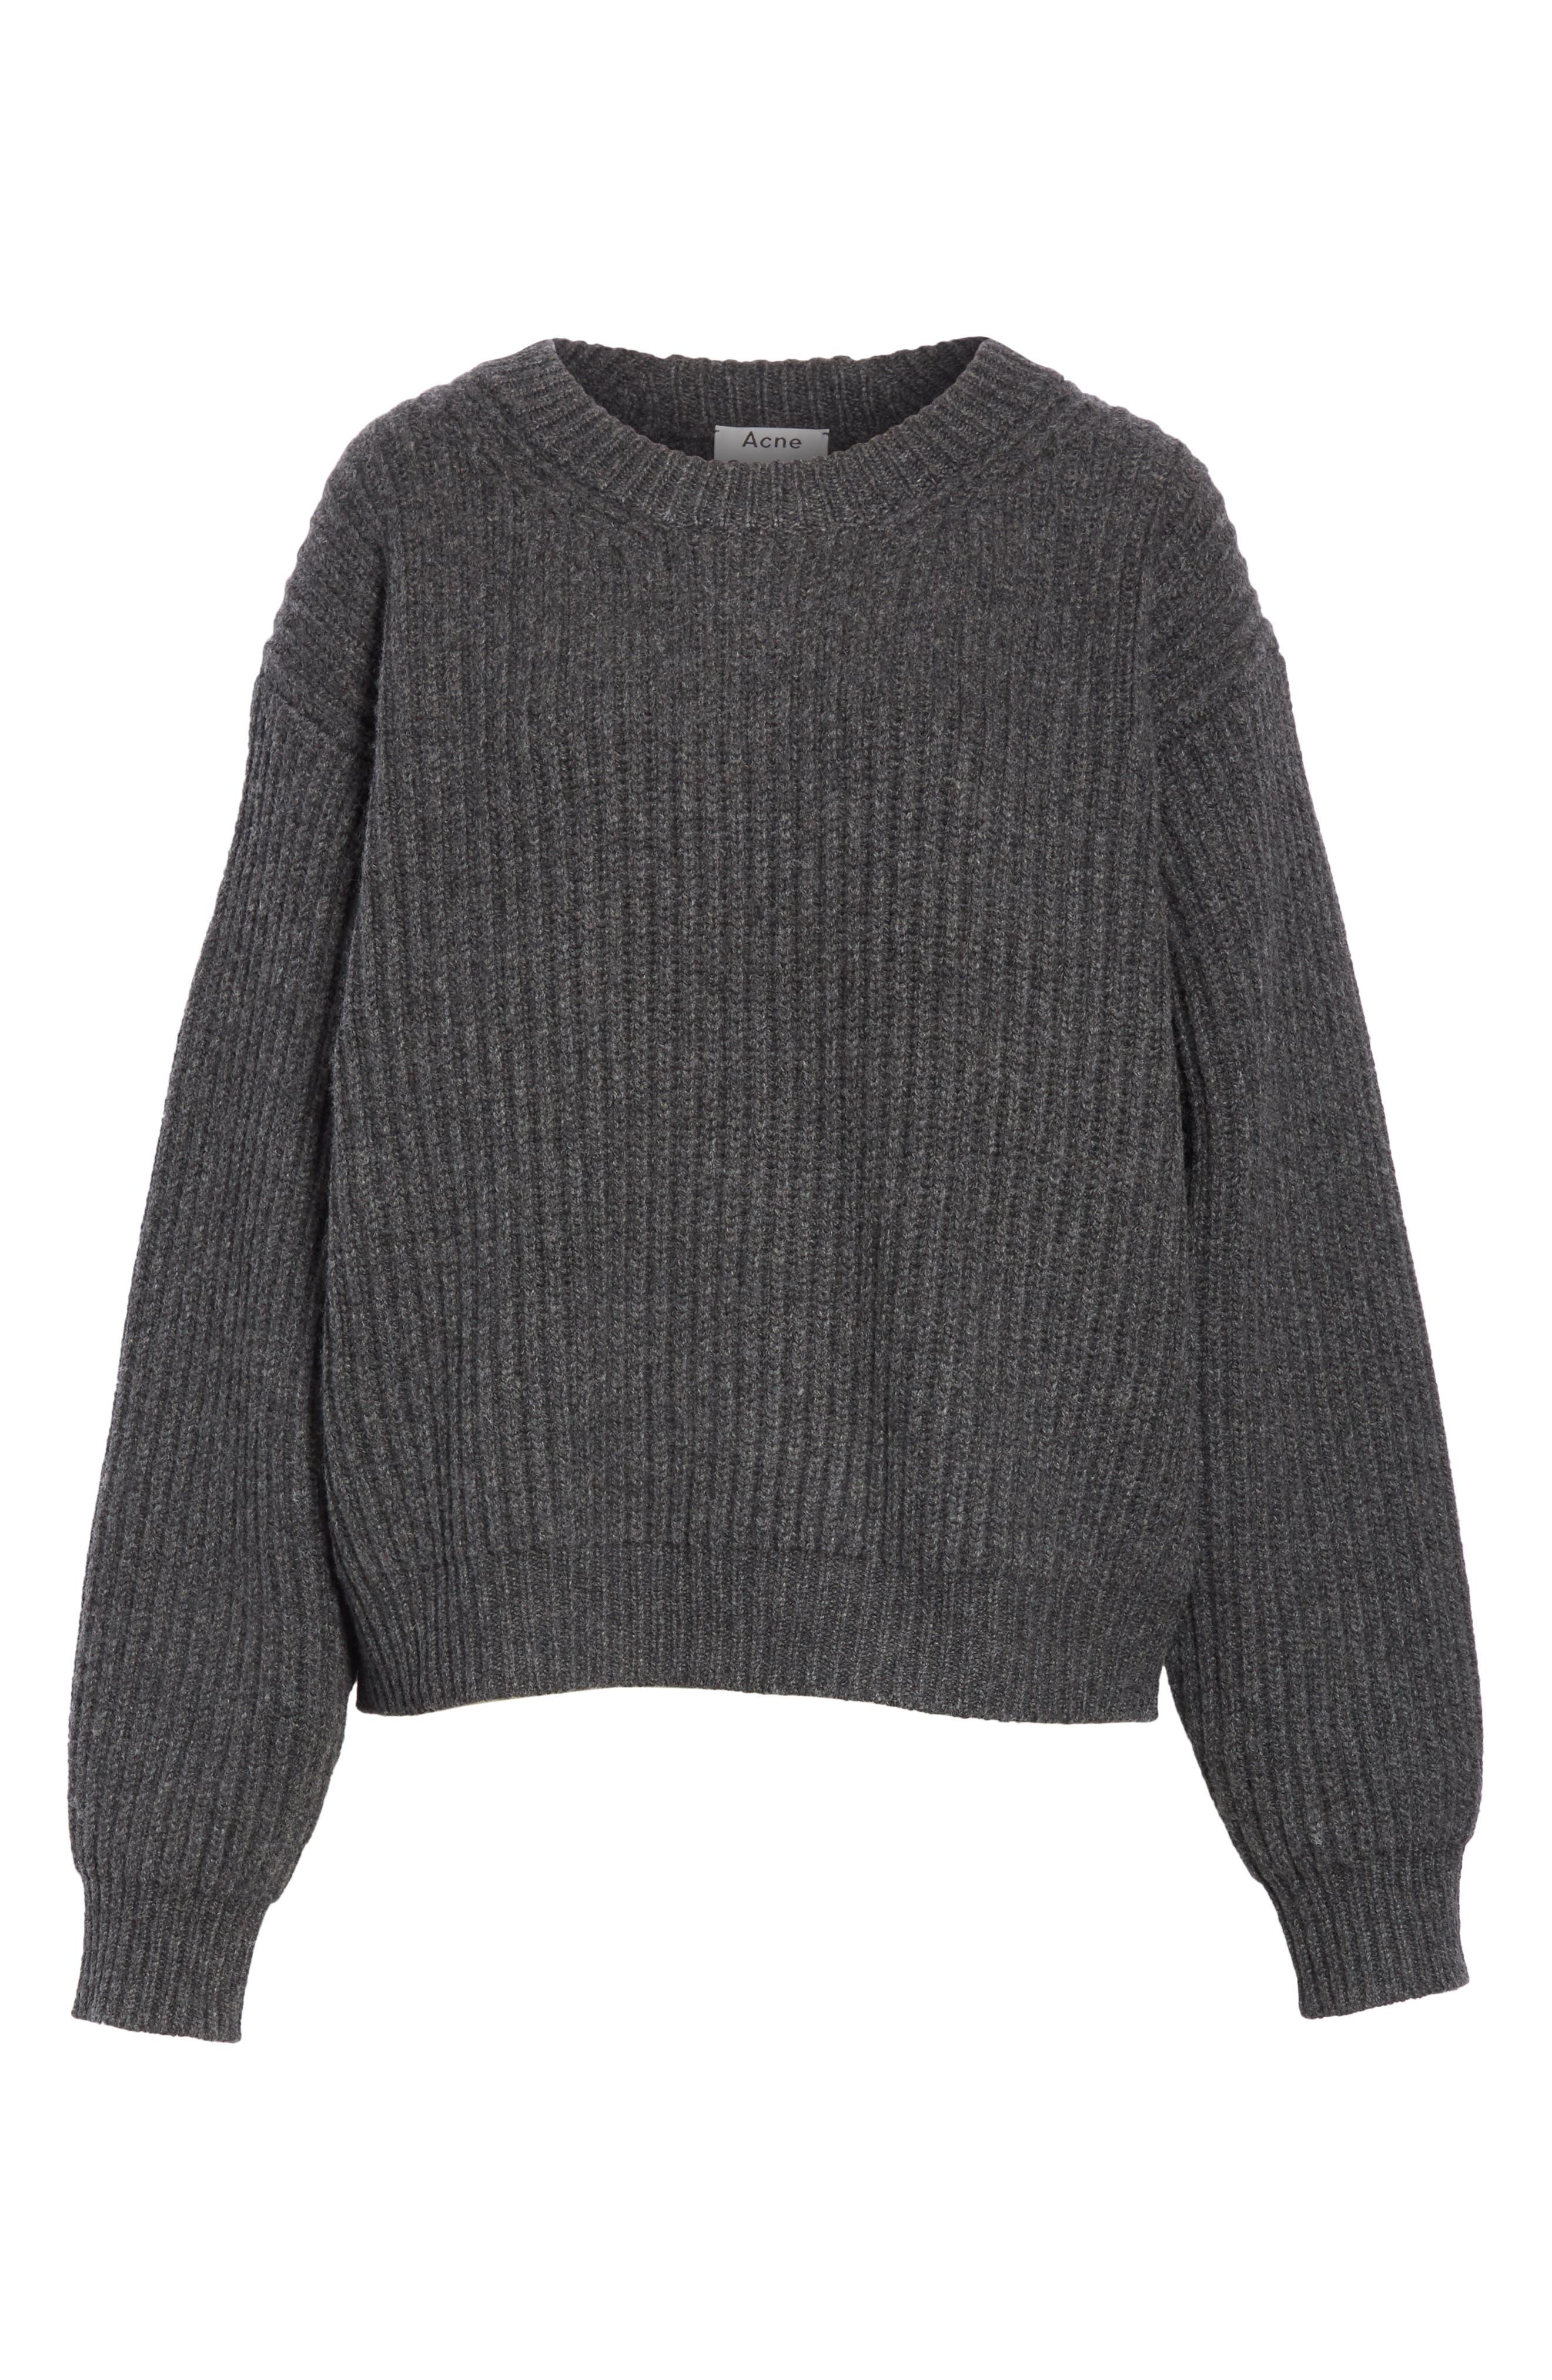 Ribbed Oversized Sweater,                             Alternate thumbnail 6, color,                             DARK GREY